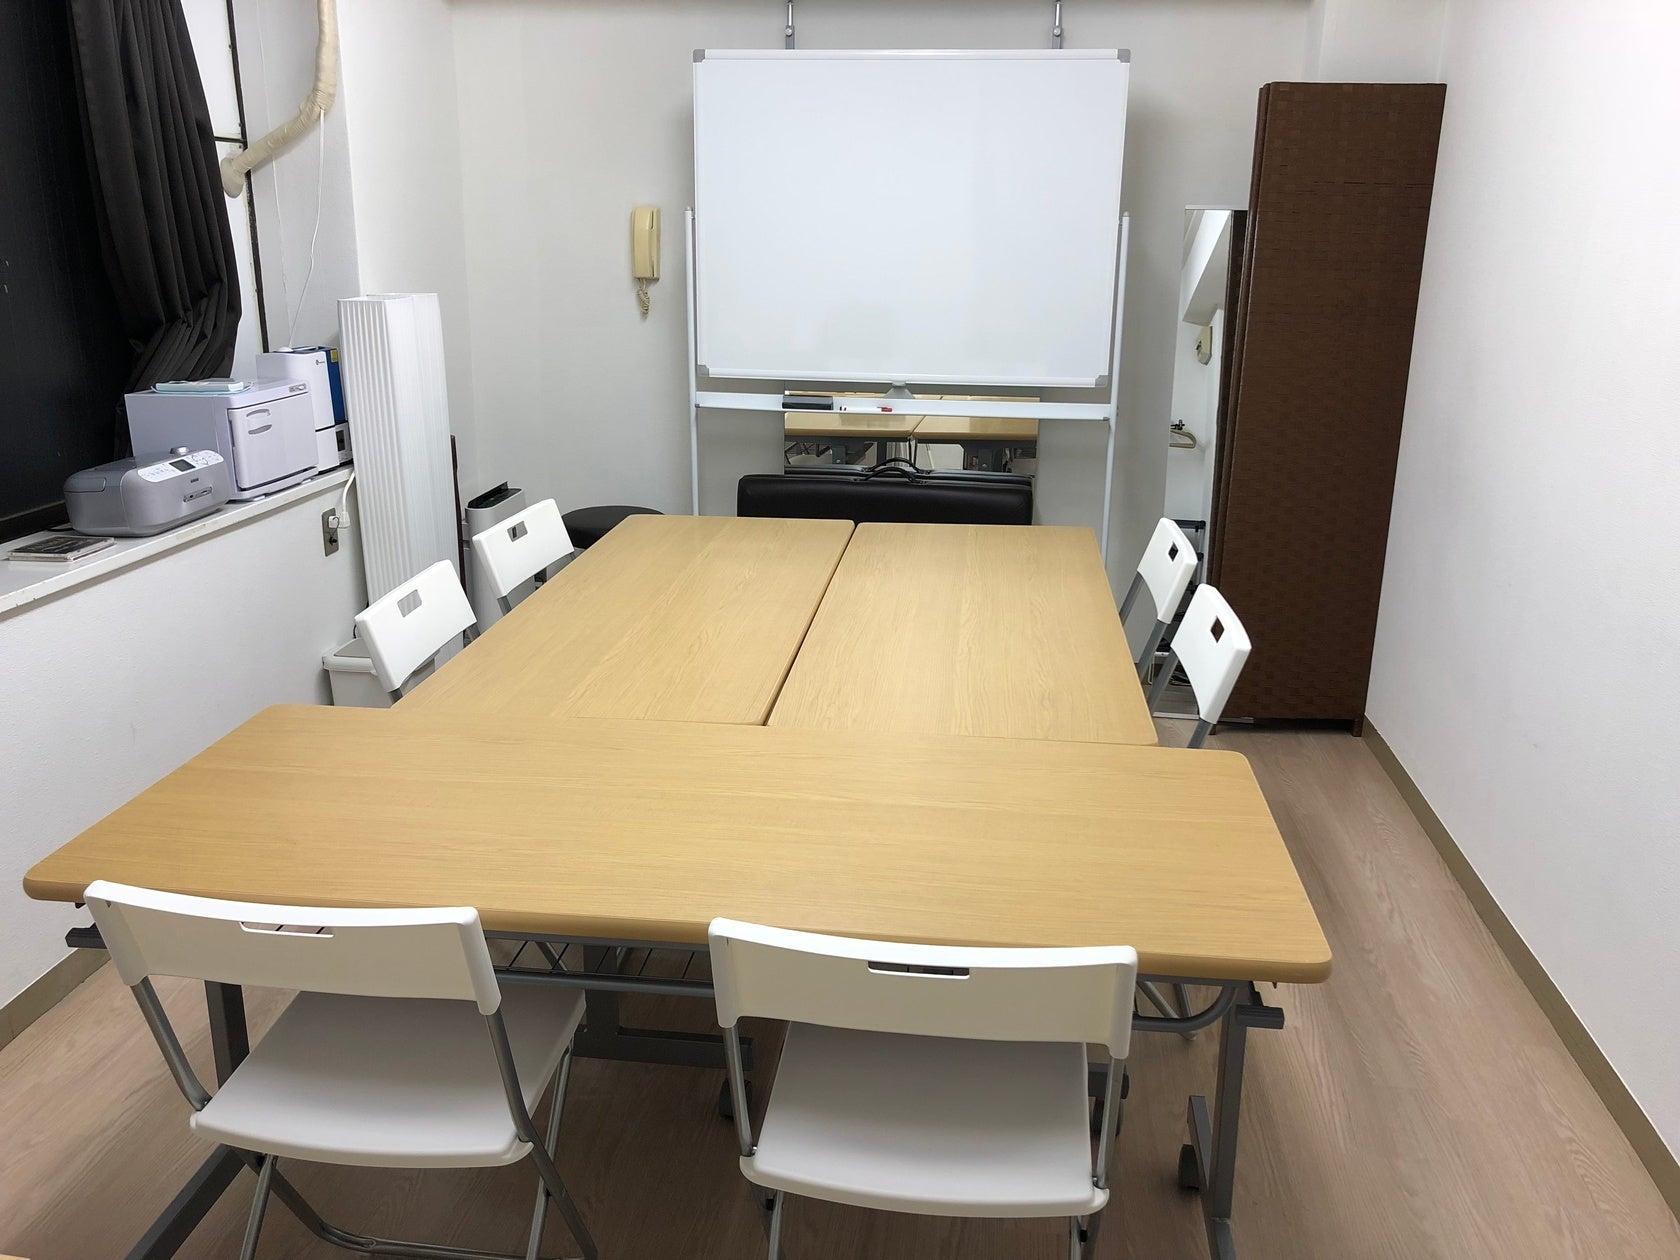 【Aルーム】横浜駅みなみ西口から徒歩6分の完全個室型レンタルスペース の写真